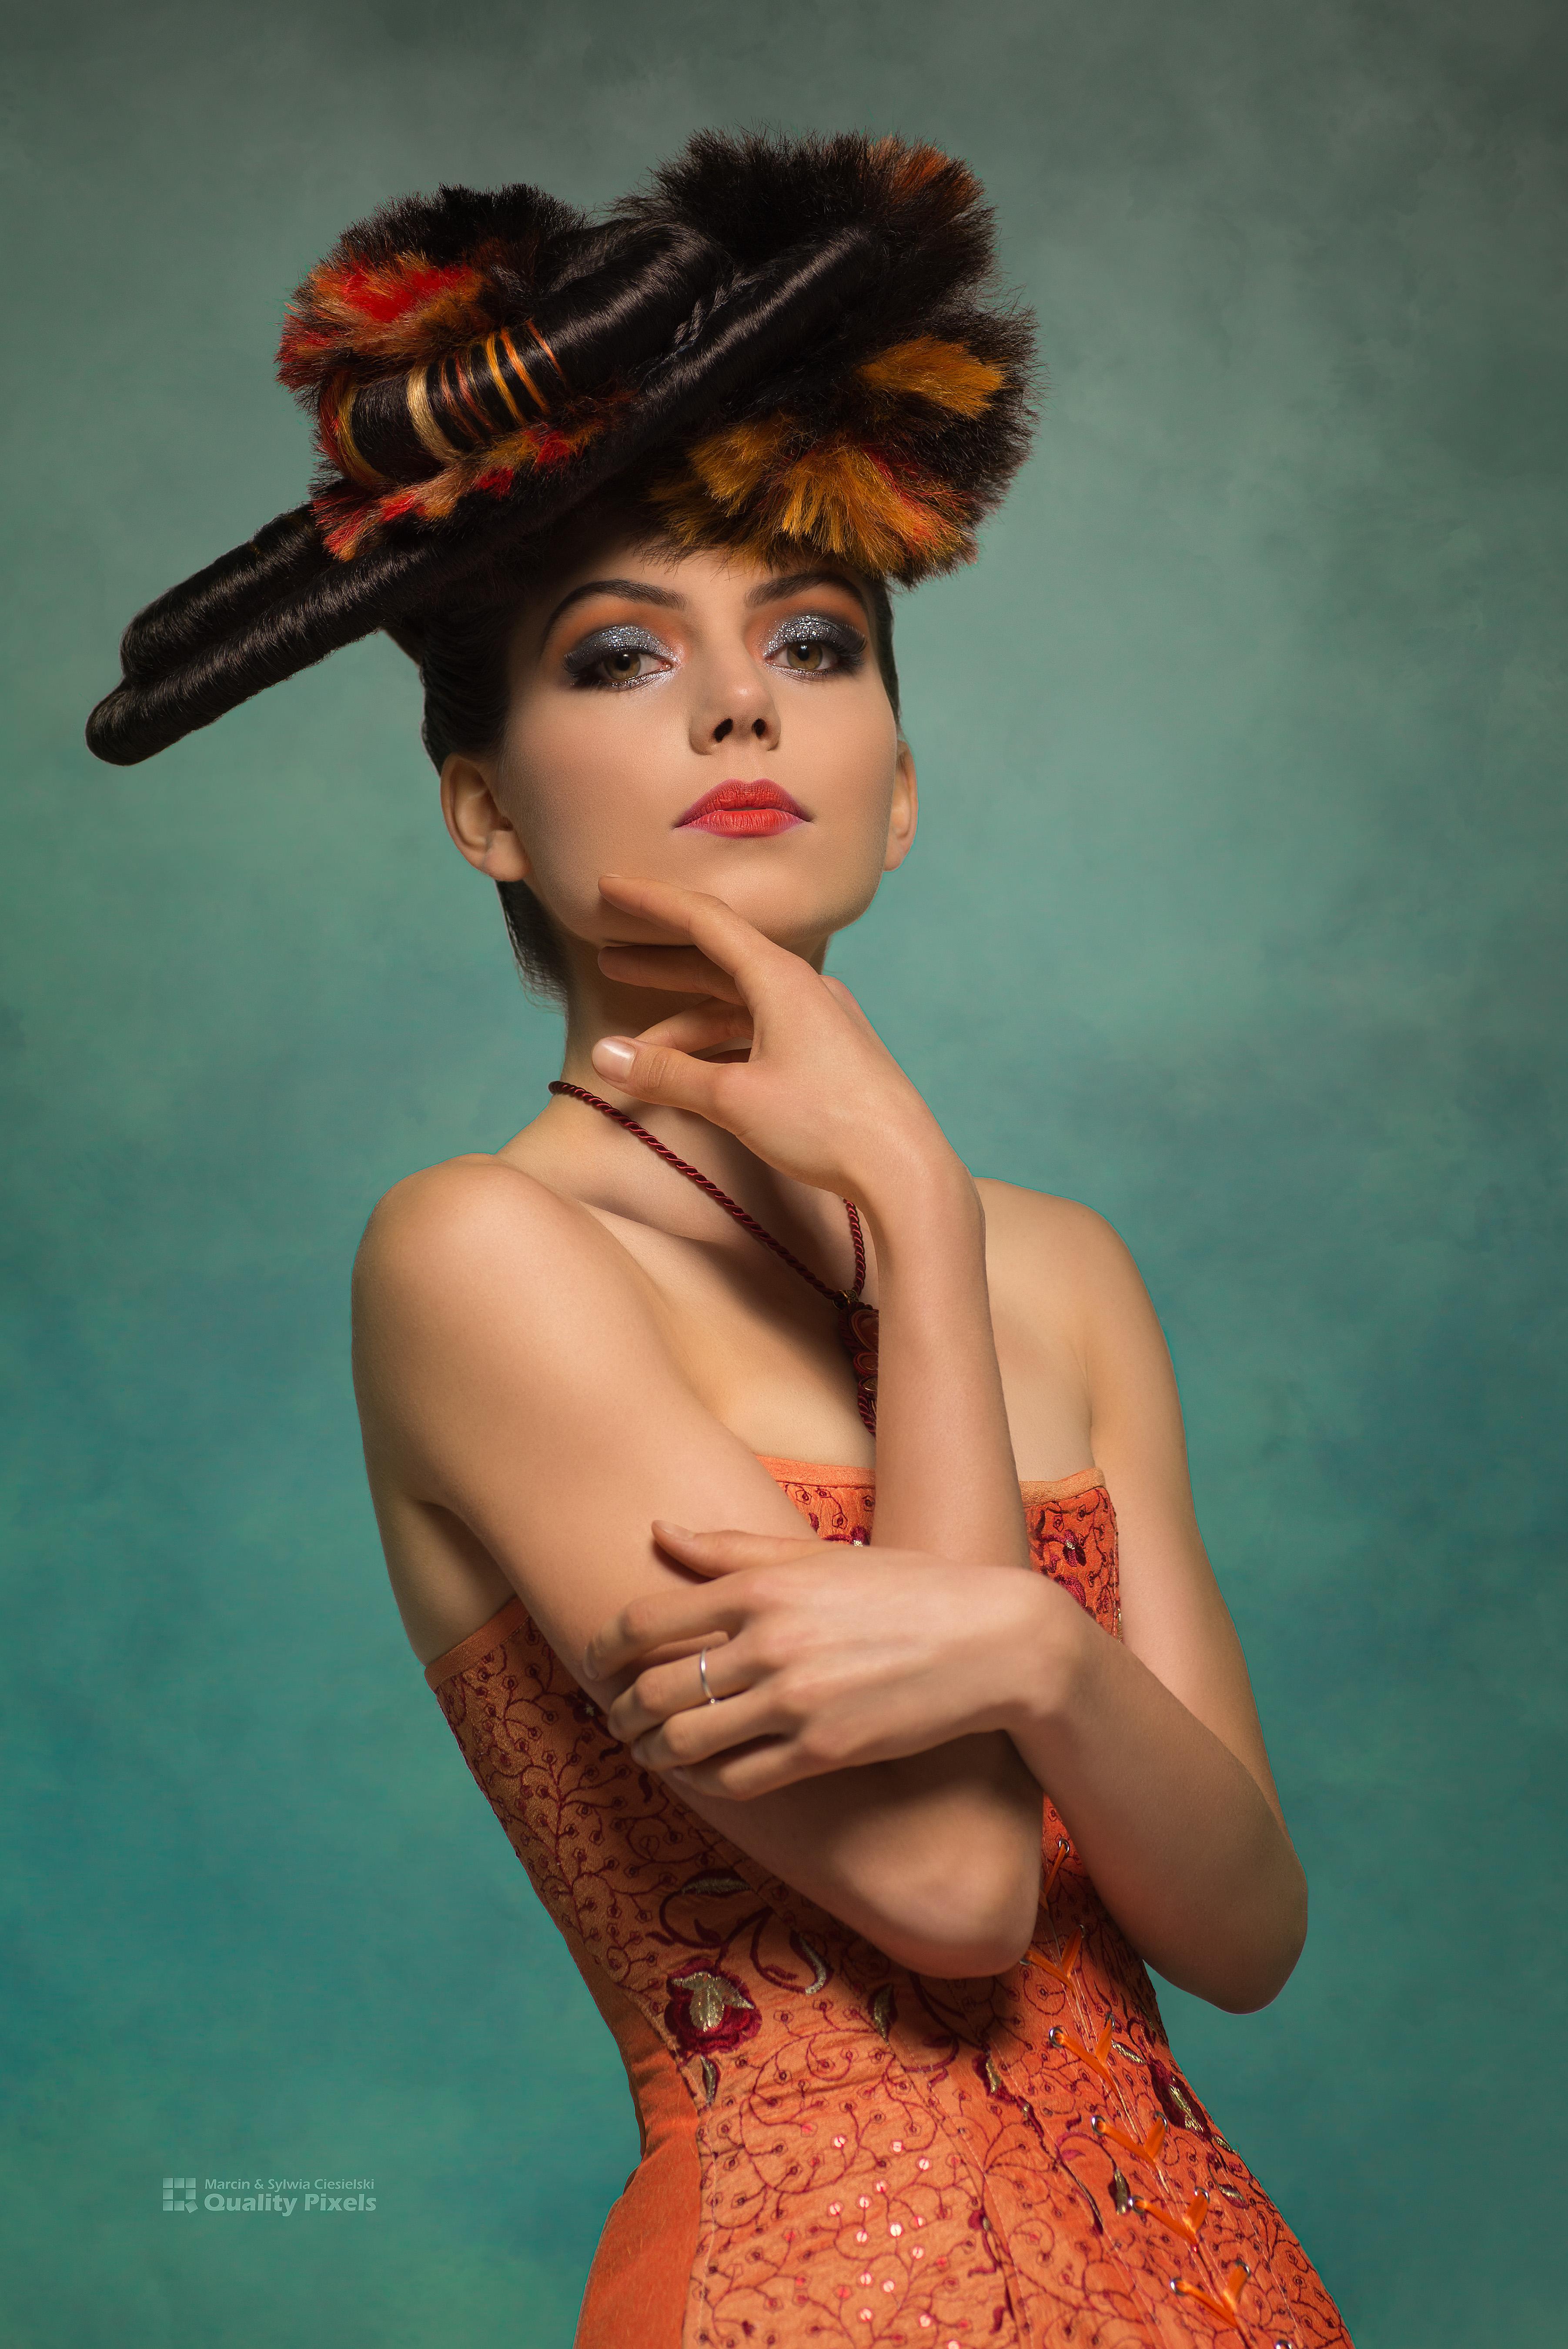 Agata Kowalska - Hair designer & instructor